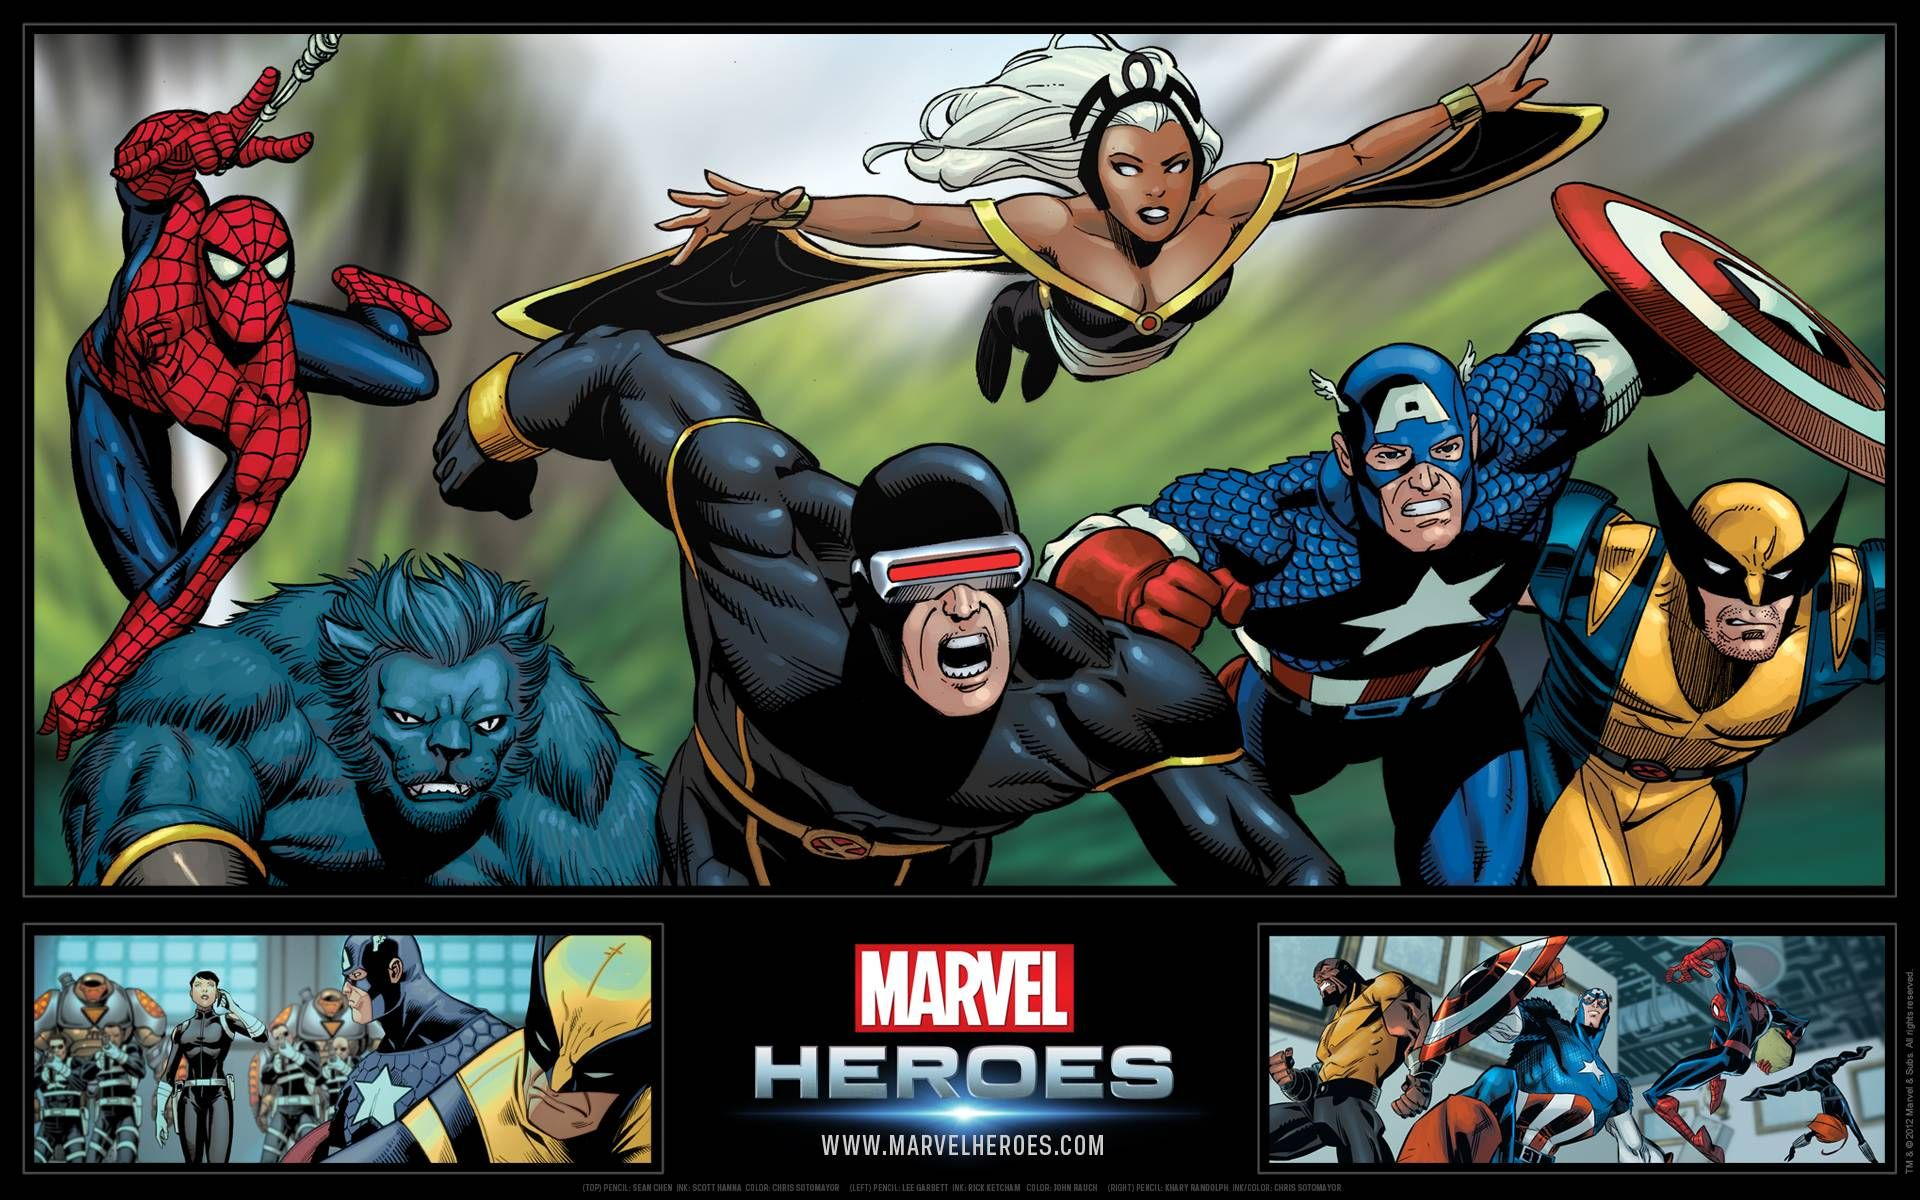 Marvel heroes hd wallpapers download free marvel heroes tumblr marvel heroes hd wallpapers download free marvel heroes tumblr voltagebd Image collections